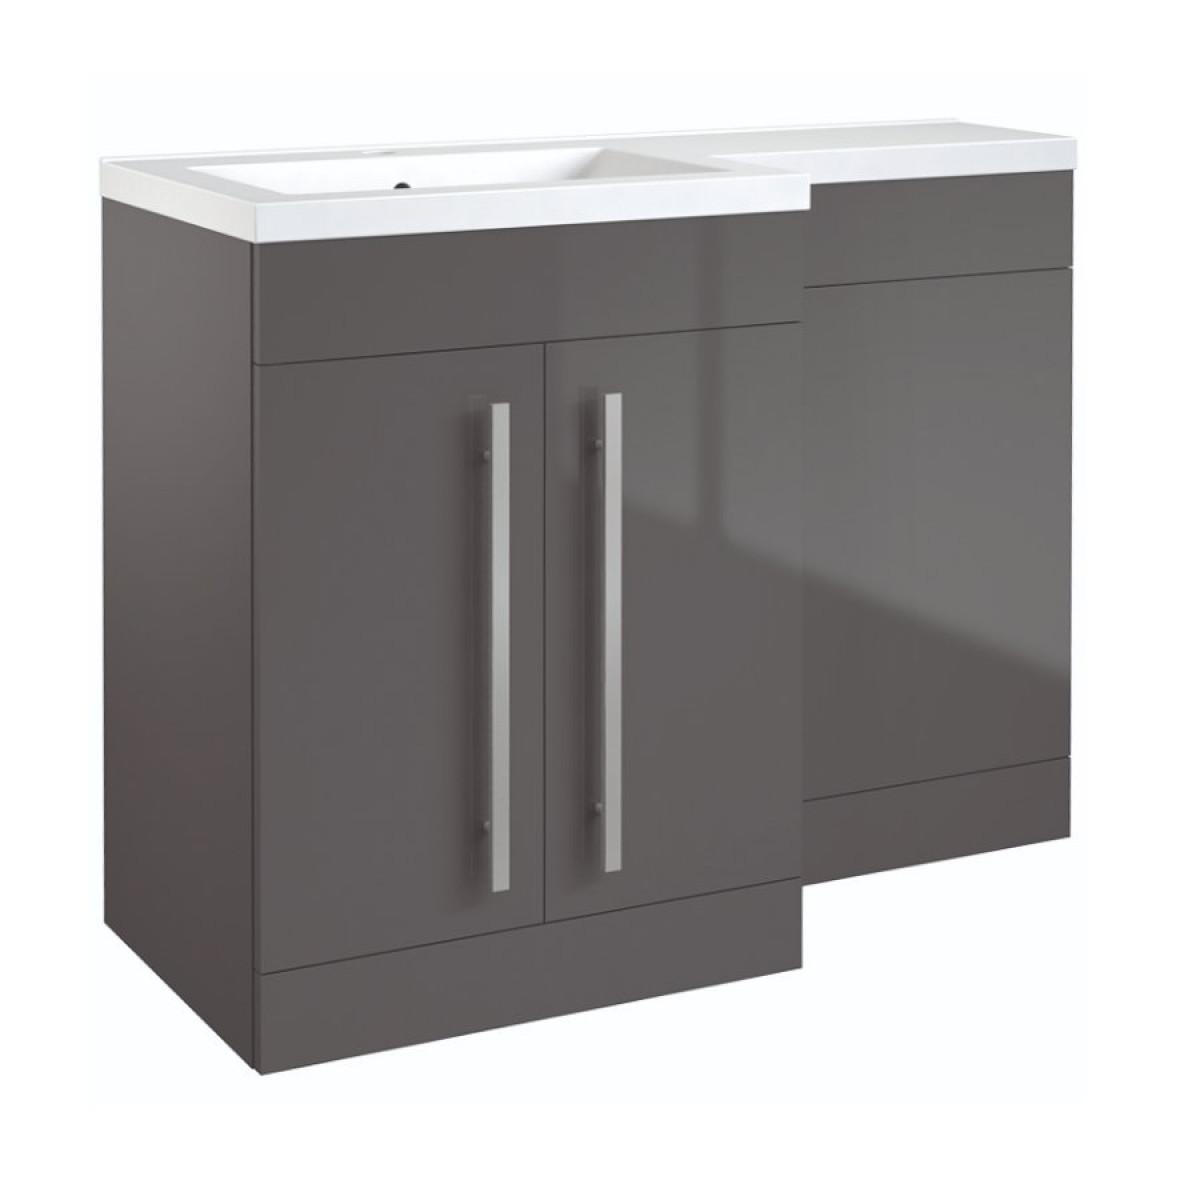 Kartell Matrix 2 Door L Shaped Furniture Pack 1100mm